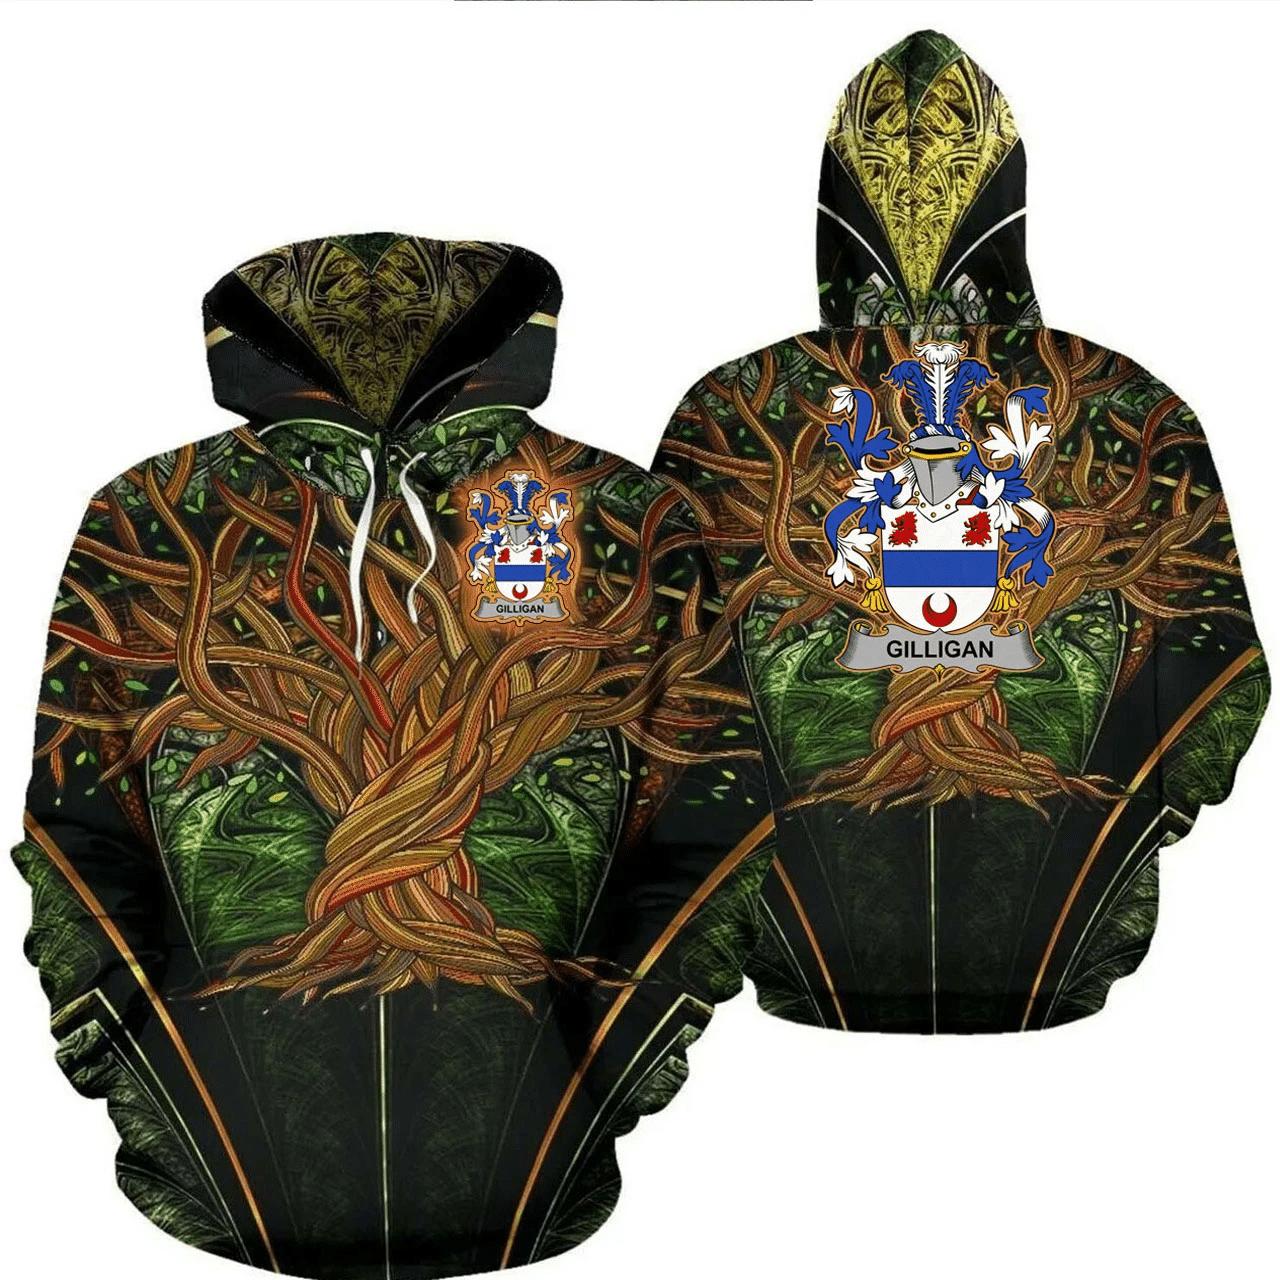 1stIreland Ireland Hoodie - Gilligan or McGilligan Irish Family Crest Hoodie - Tree Of Life A7